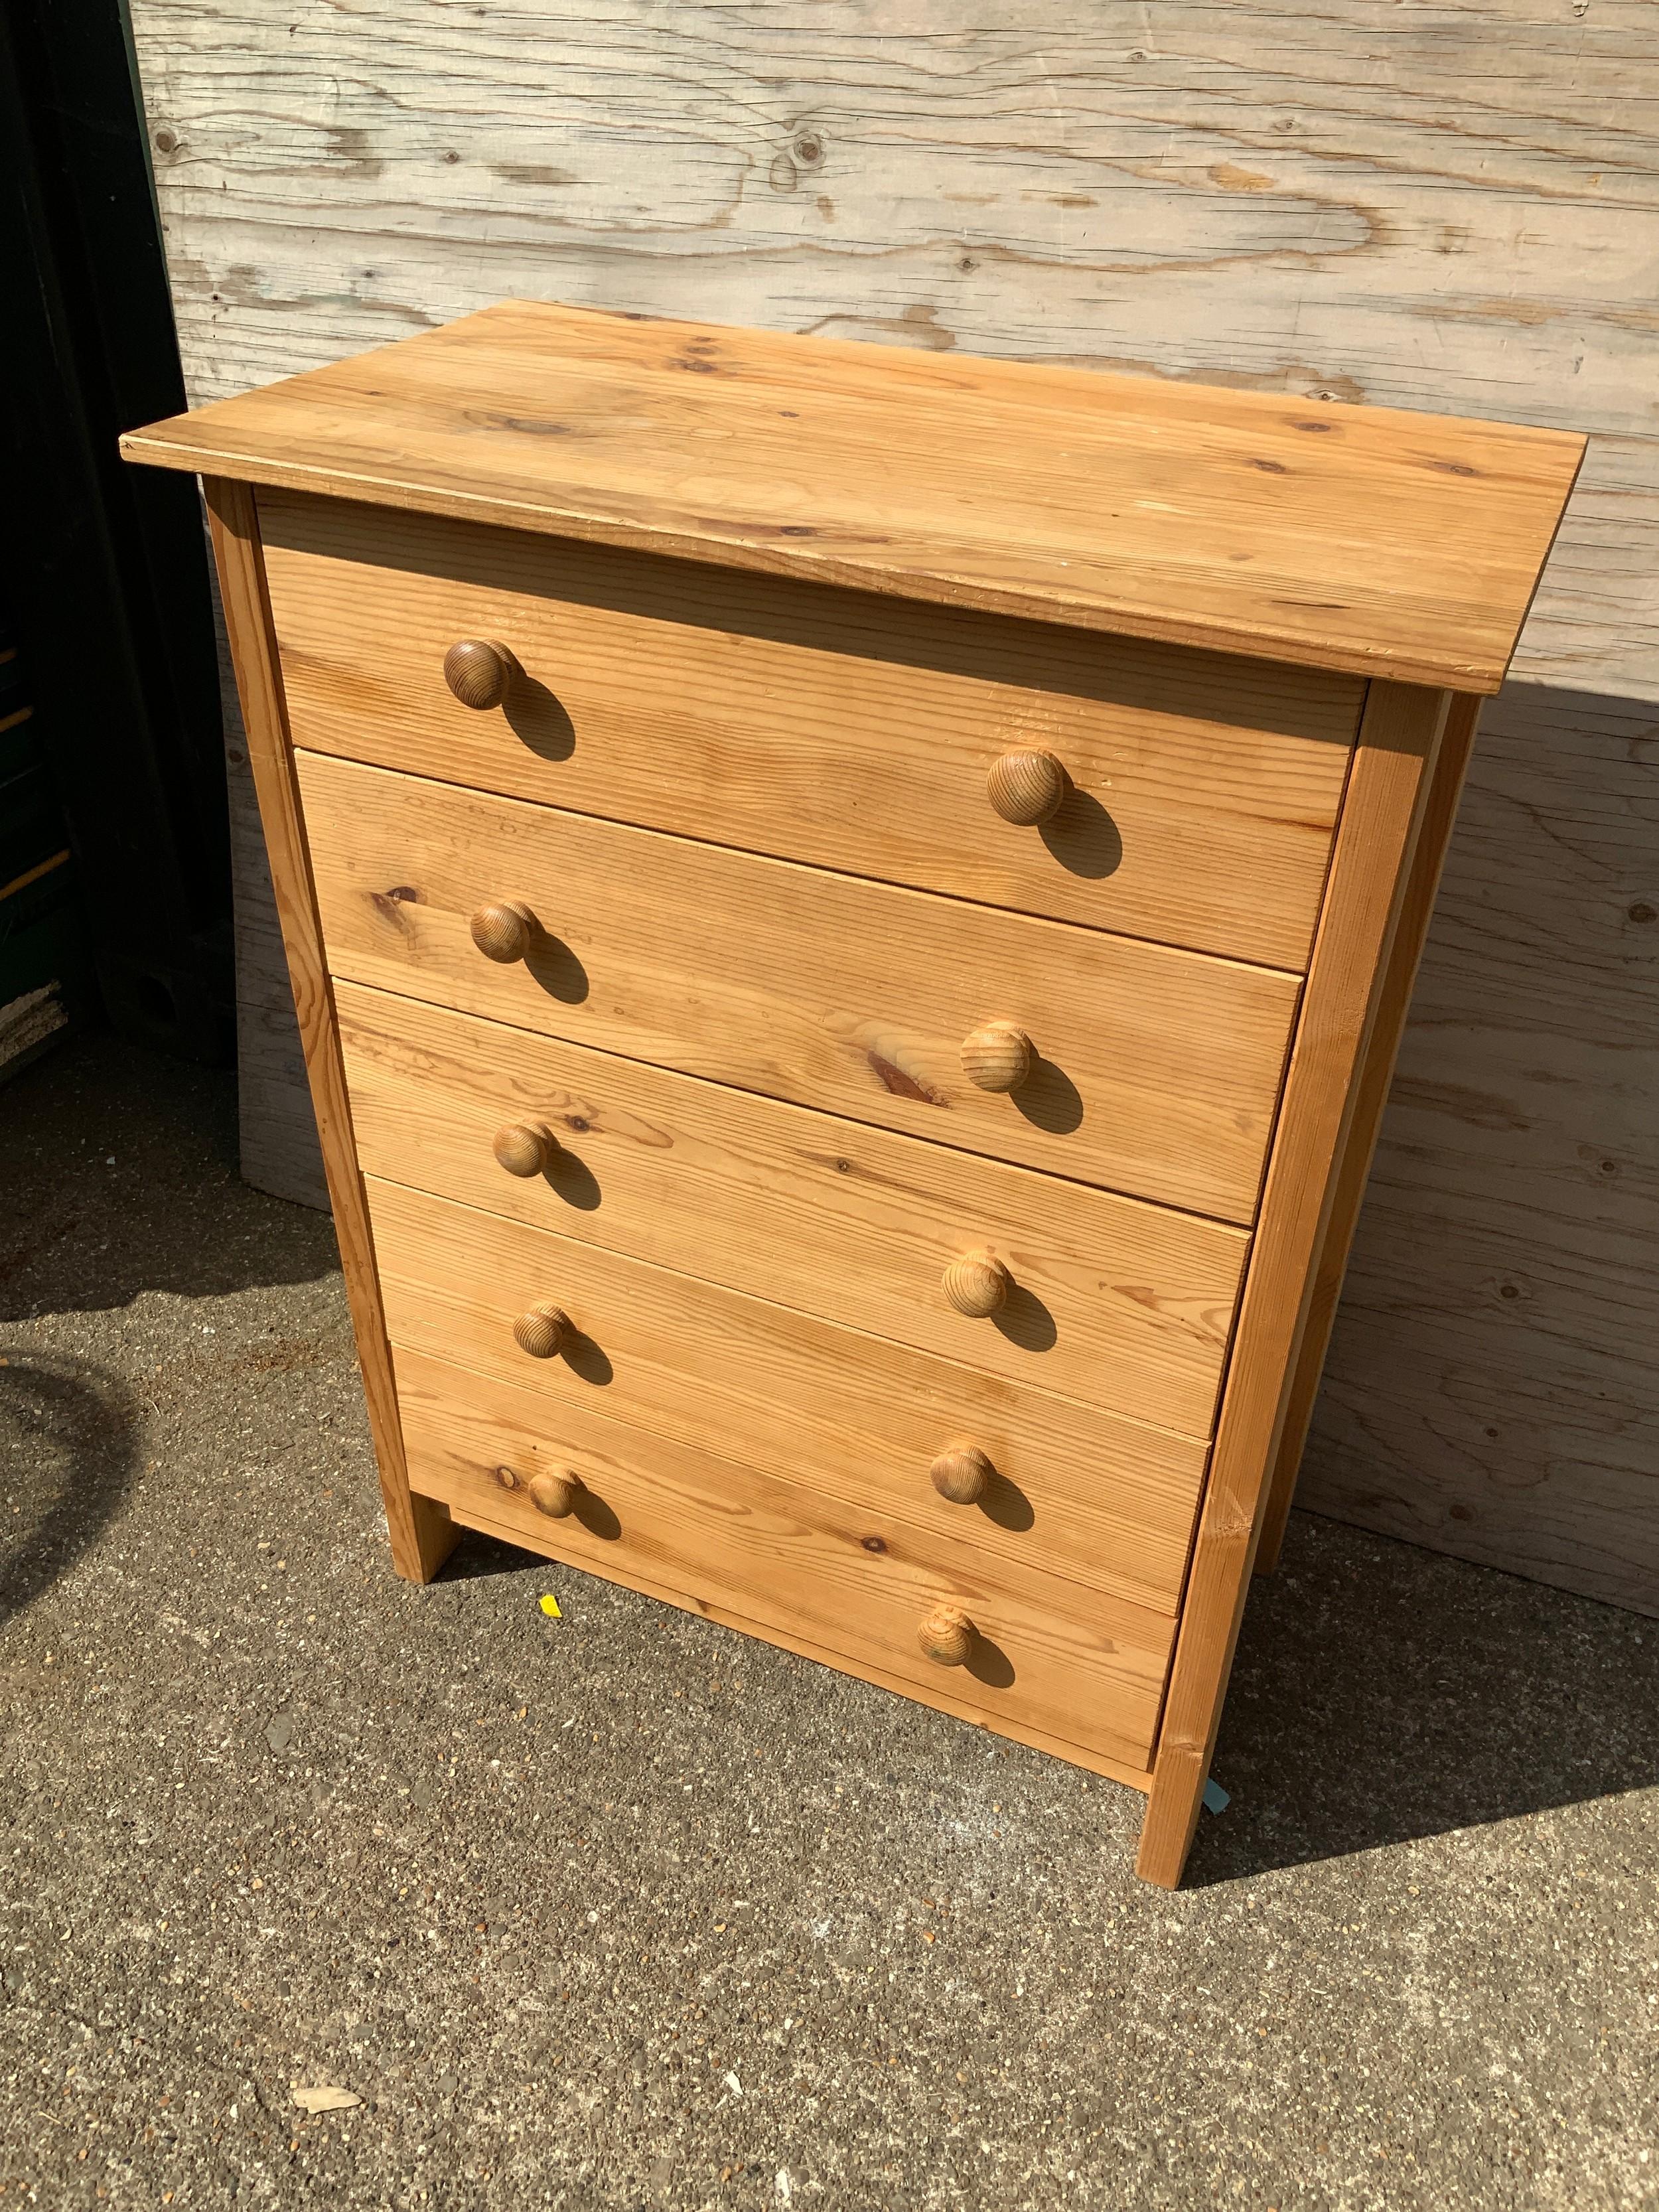 Pine Chest of Drawers - 72cm W x 40cm D x 94cm H